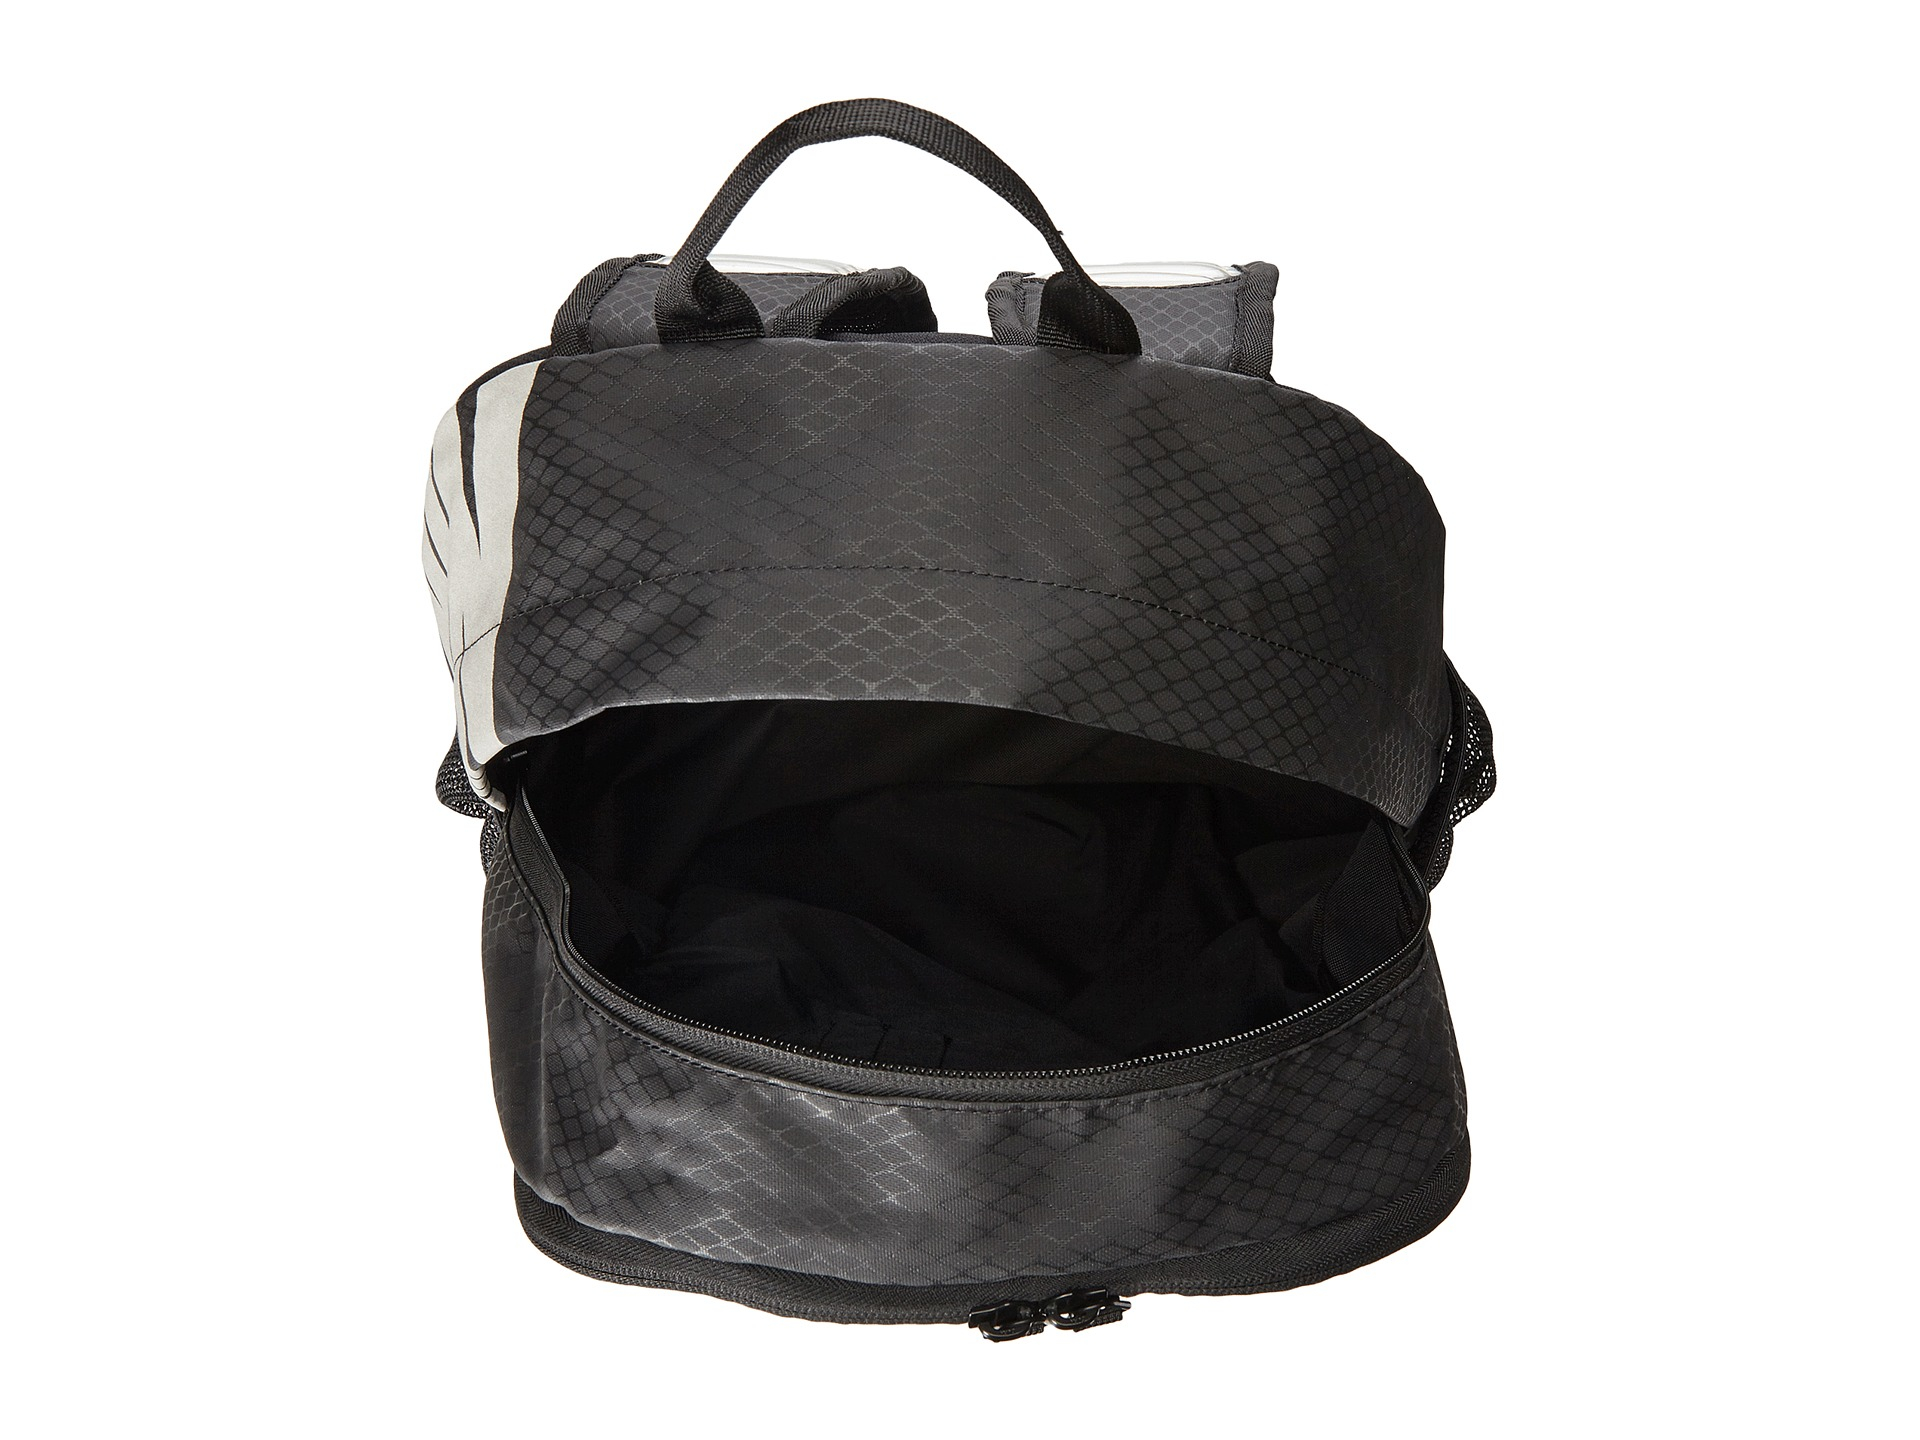 lyst nike max air vapor backpack in black